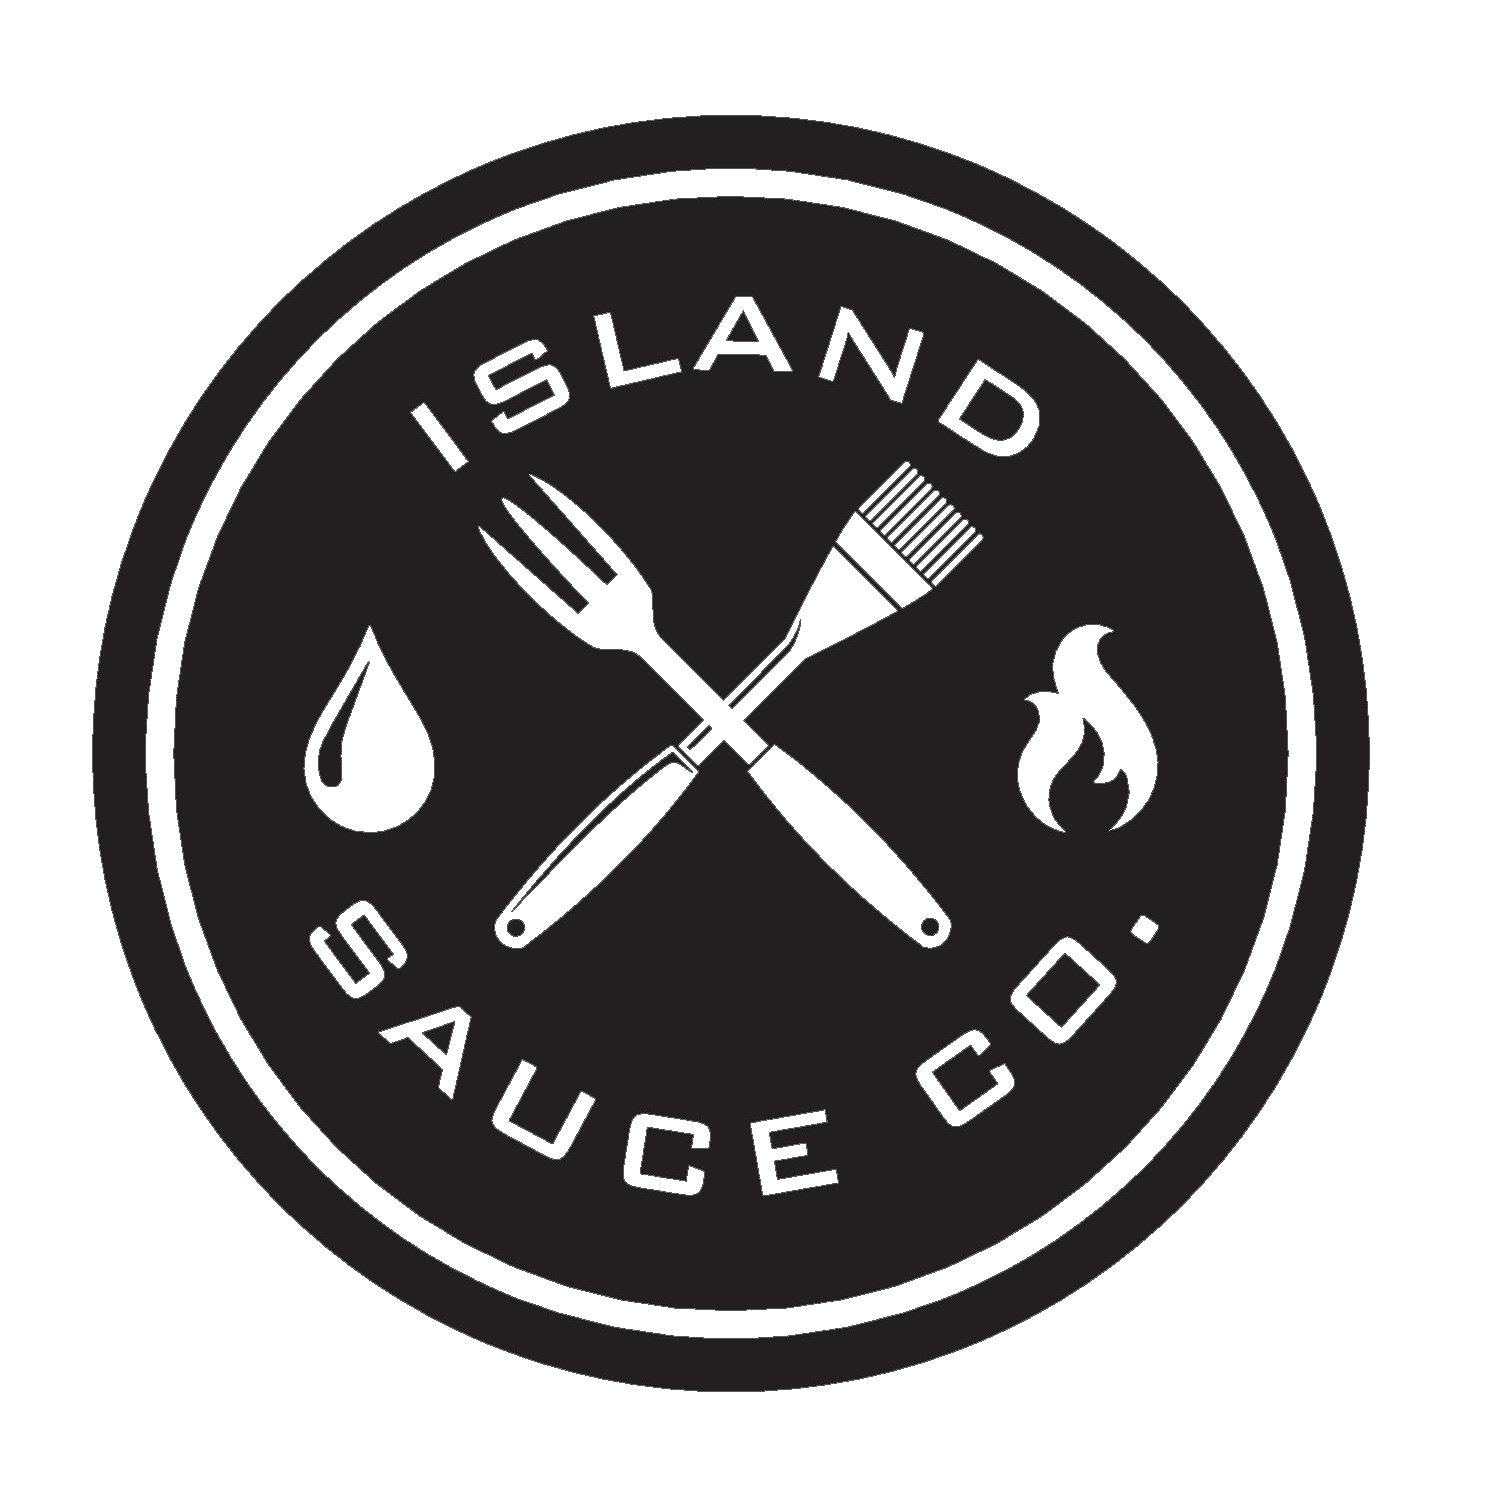 Island Sauce Co.